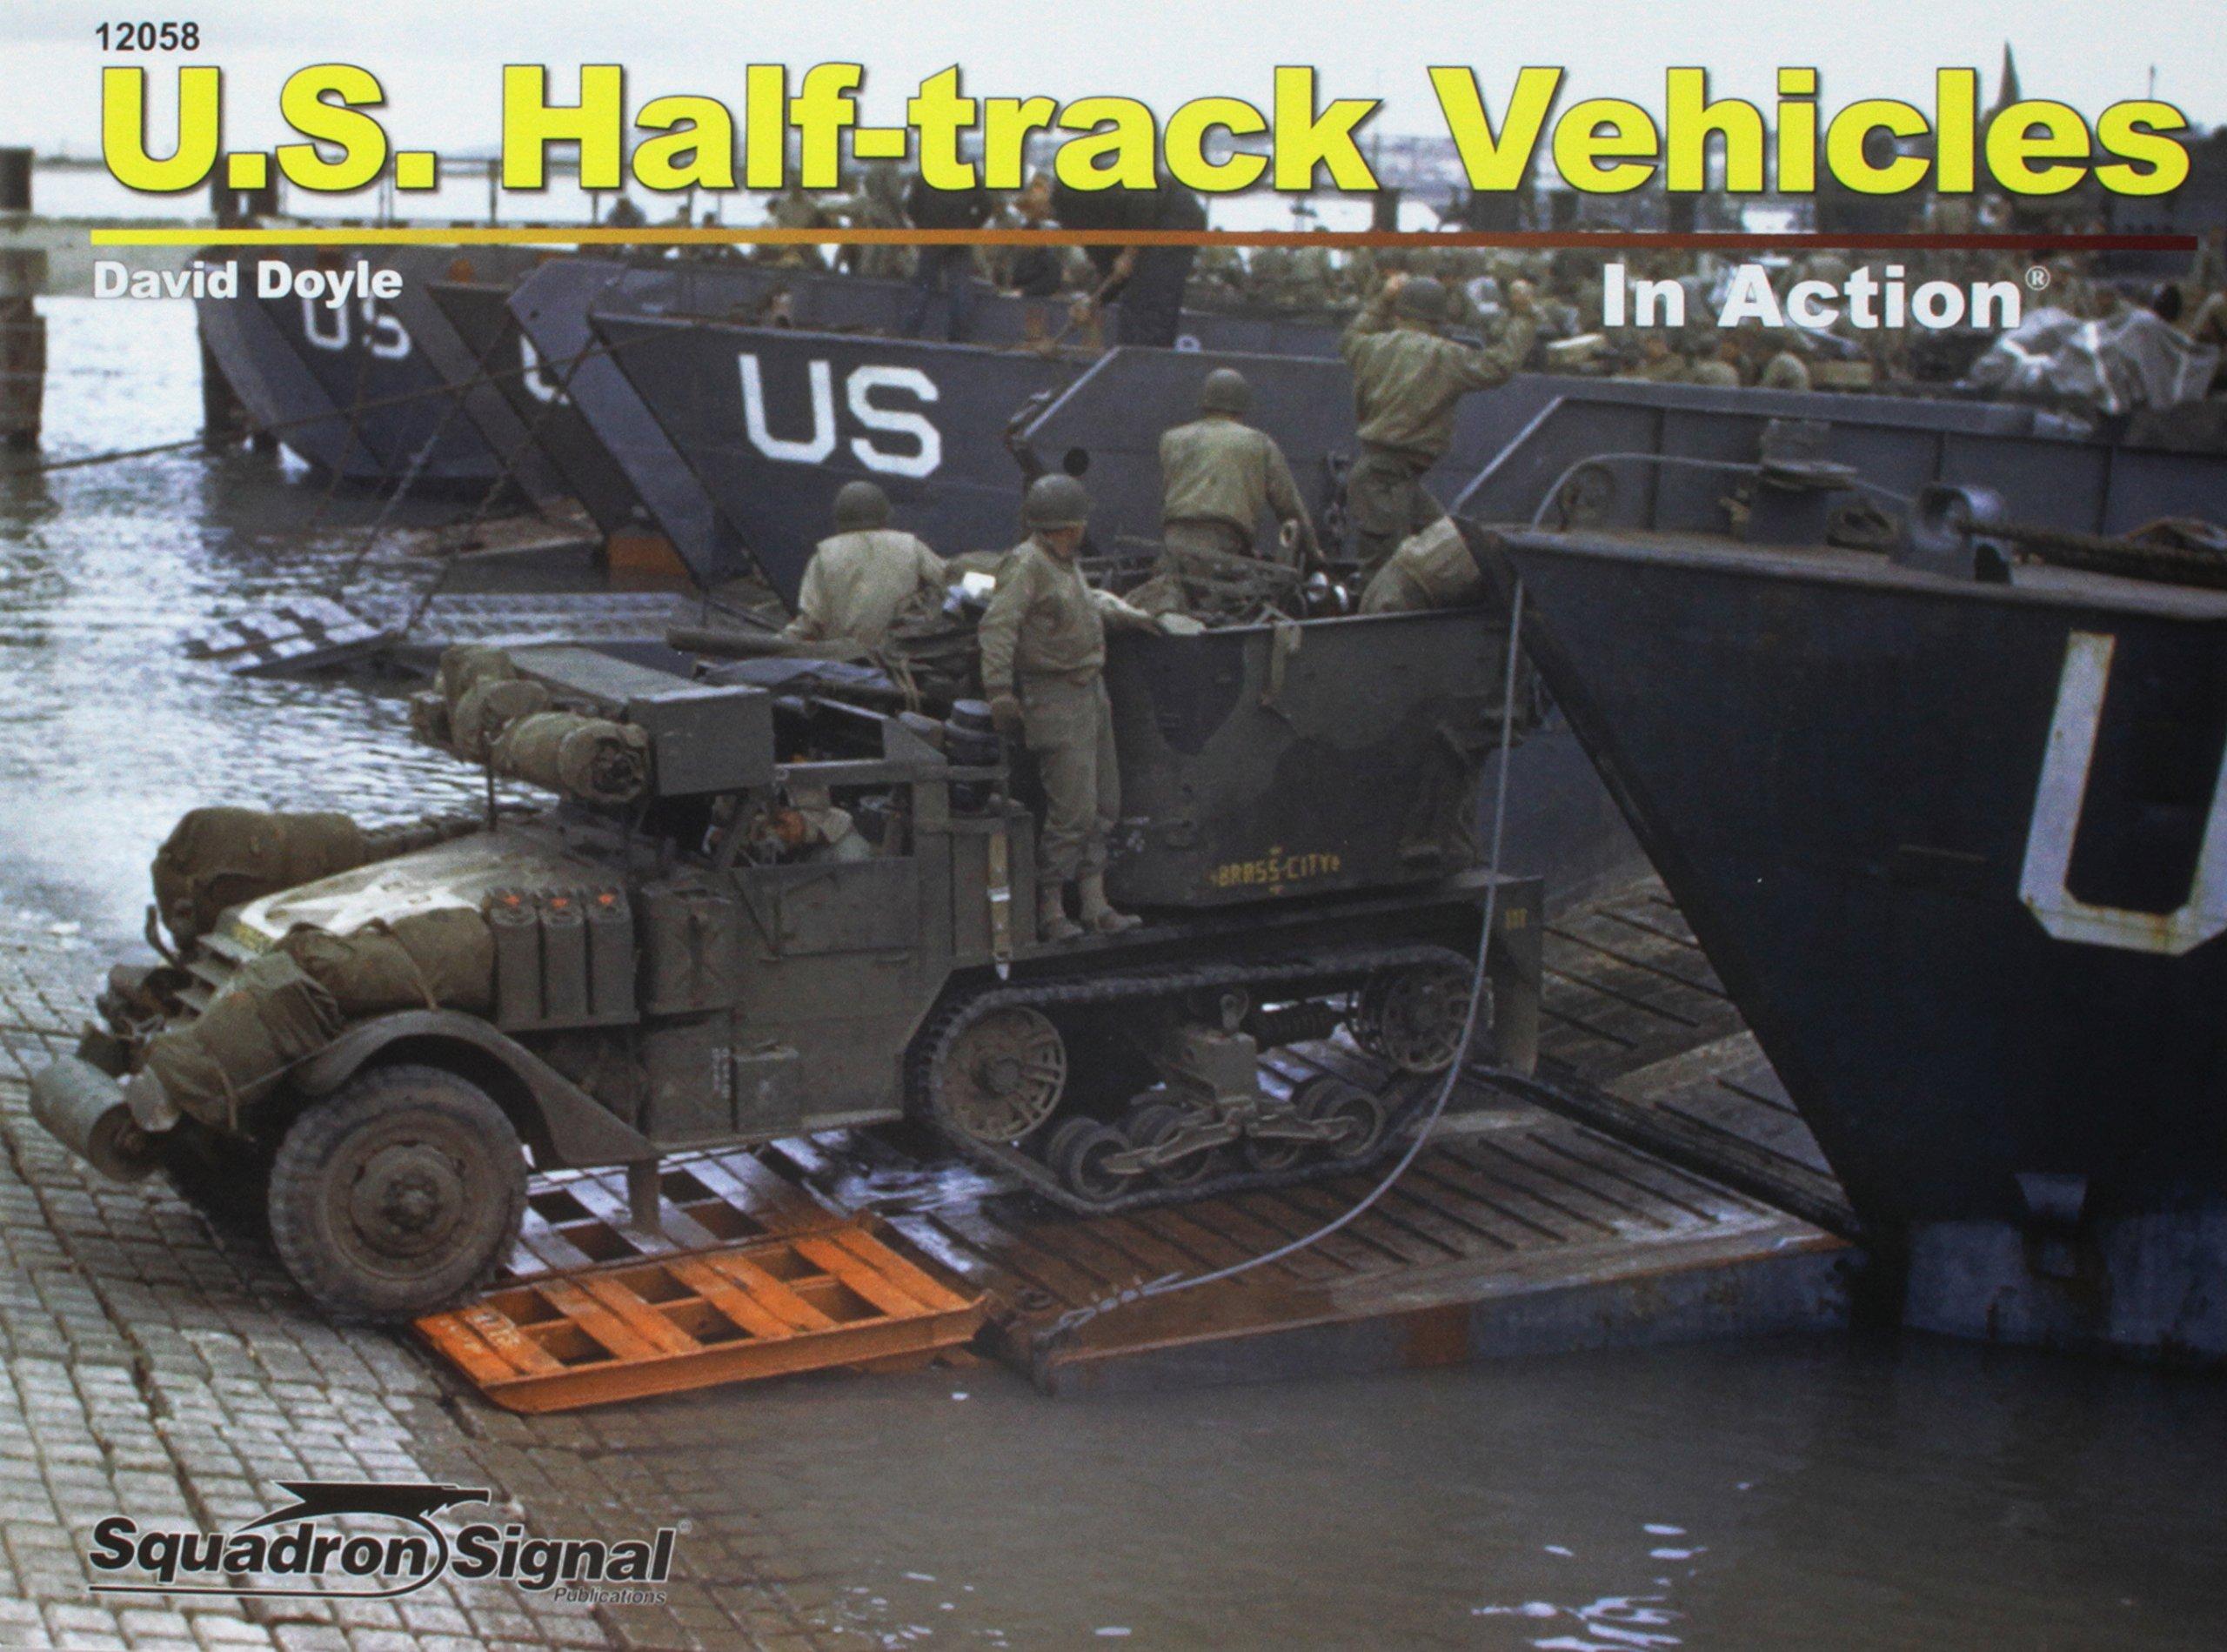 U.S. Half-Track Vehicles In Action